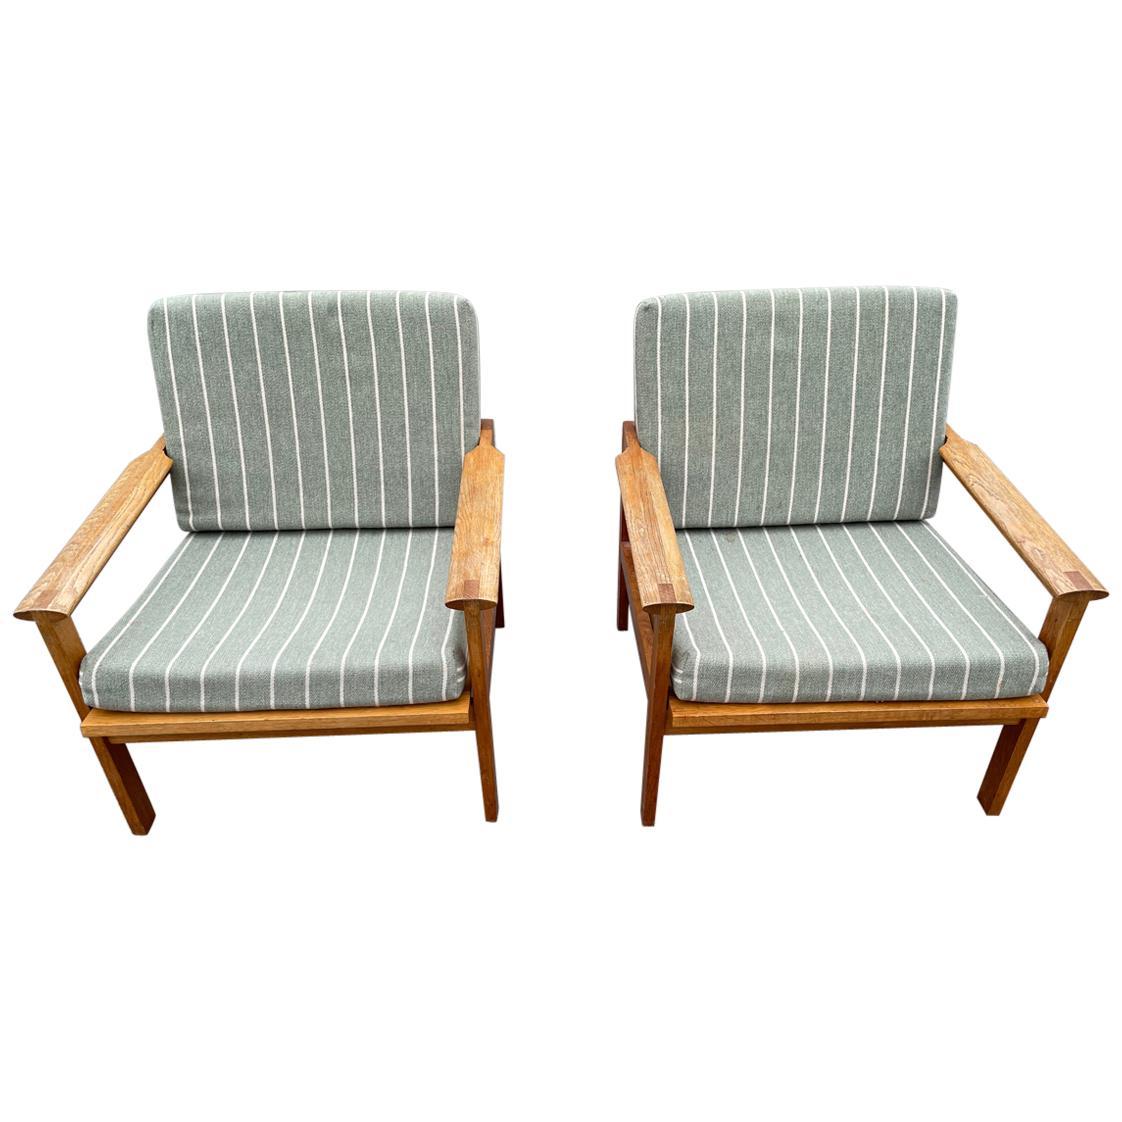 Pair of Oak Armchairs, Model Capella, Designed by Illum Wikkelsø, 1960s